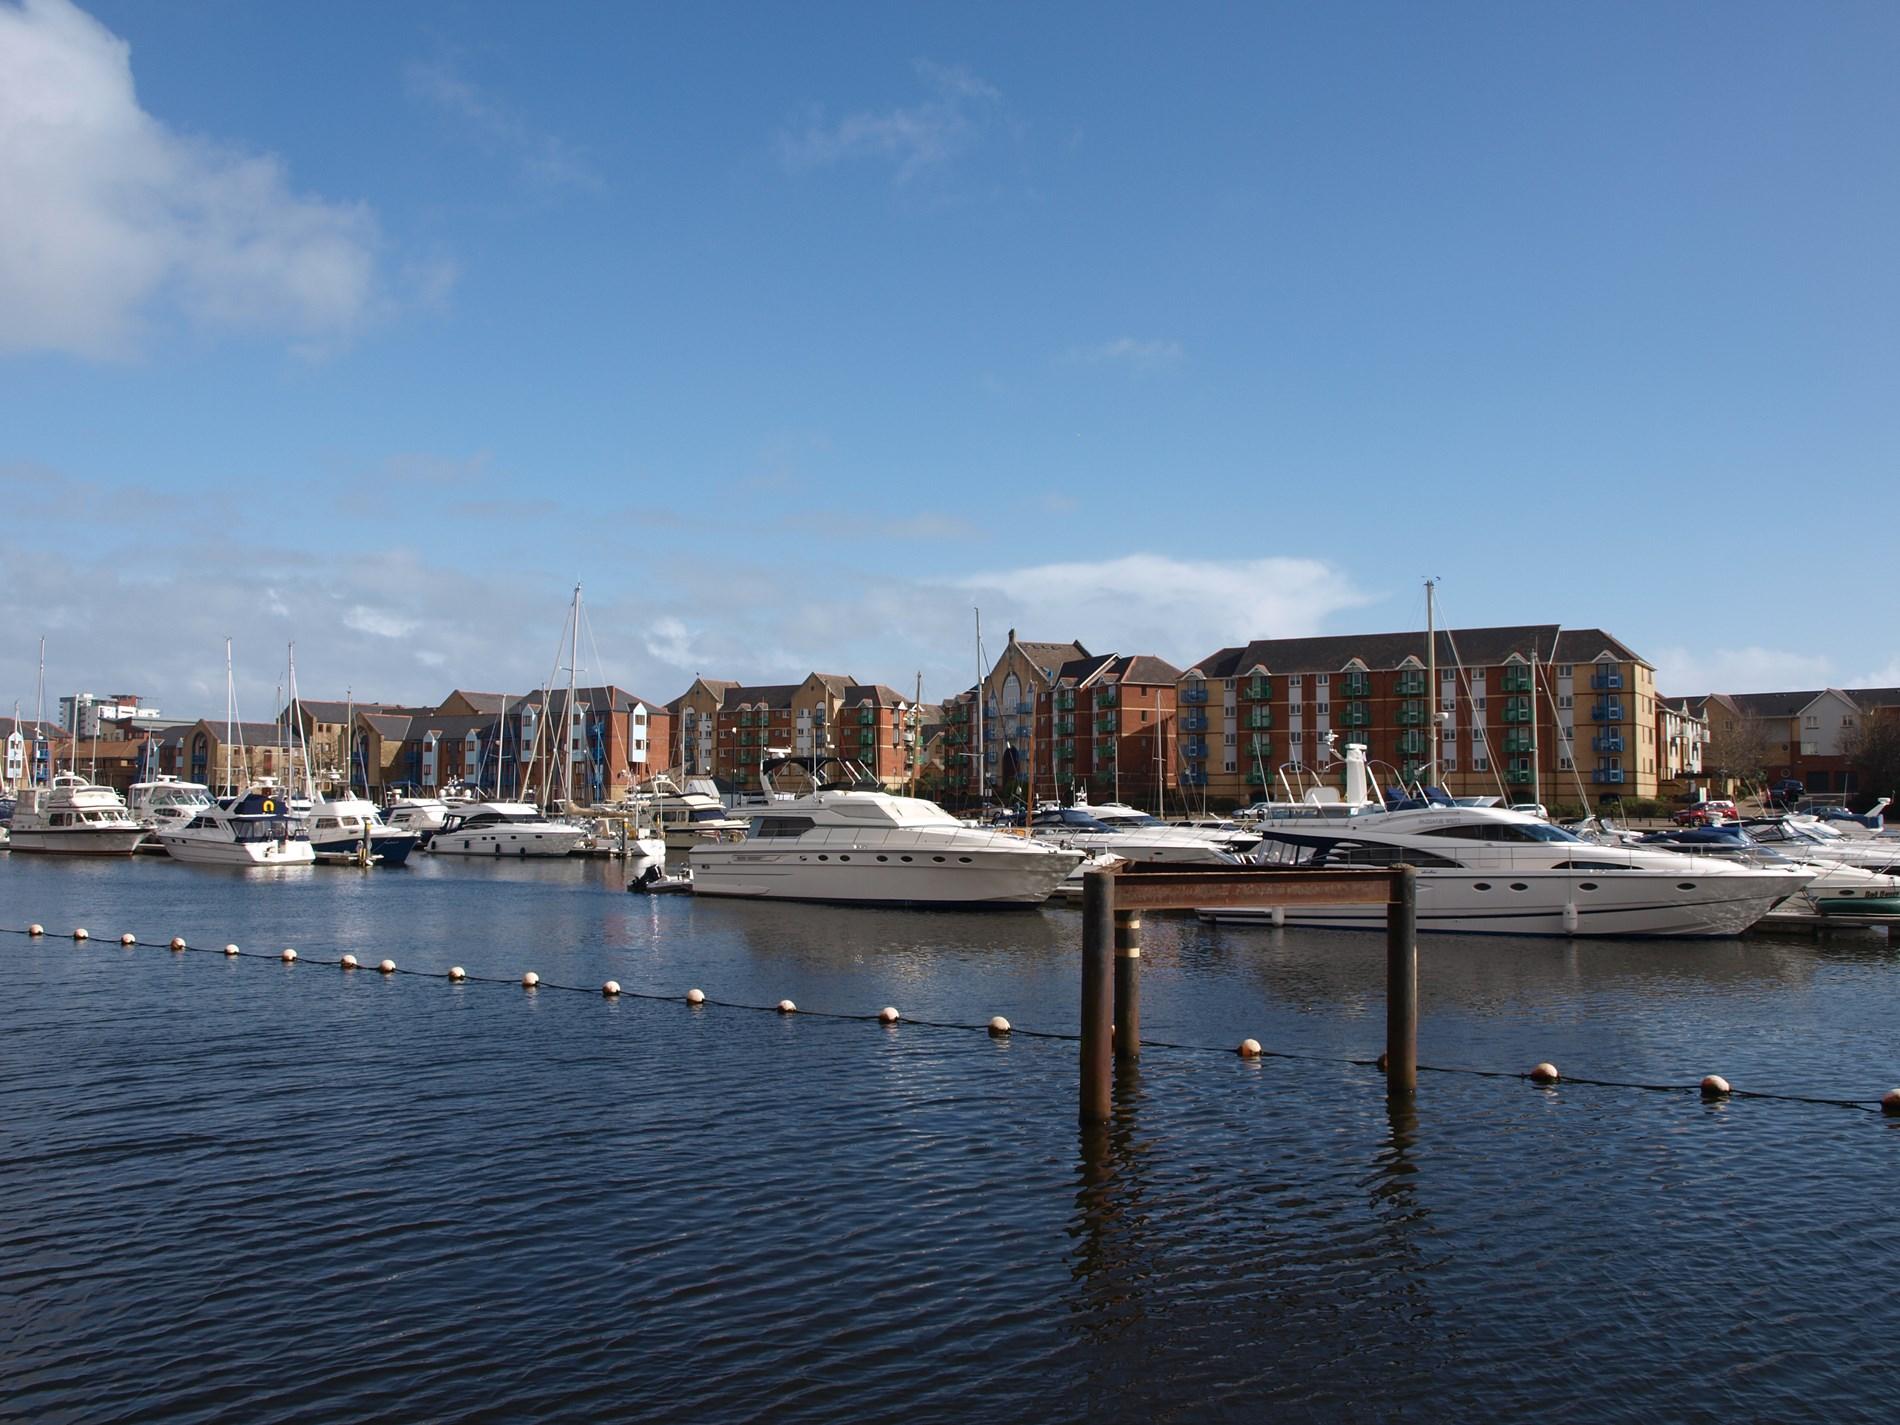 Swansea-Photos-1